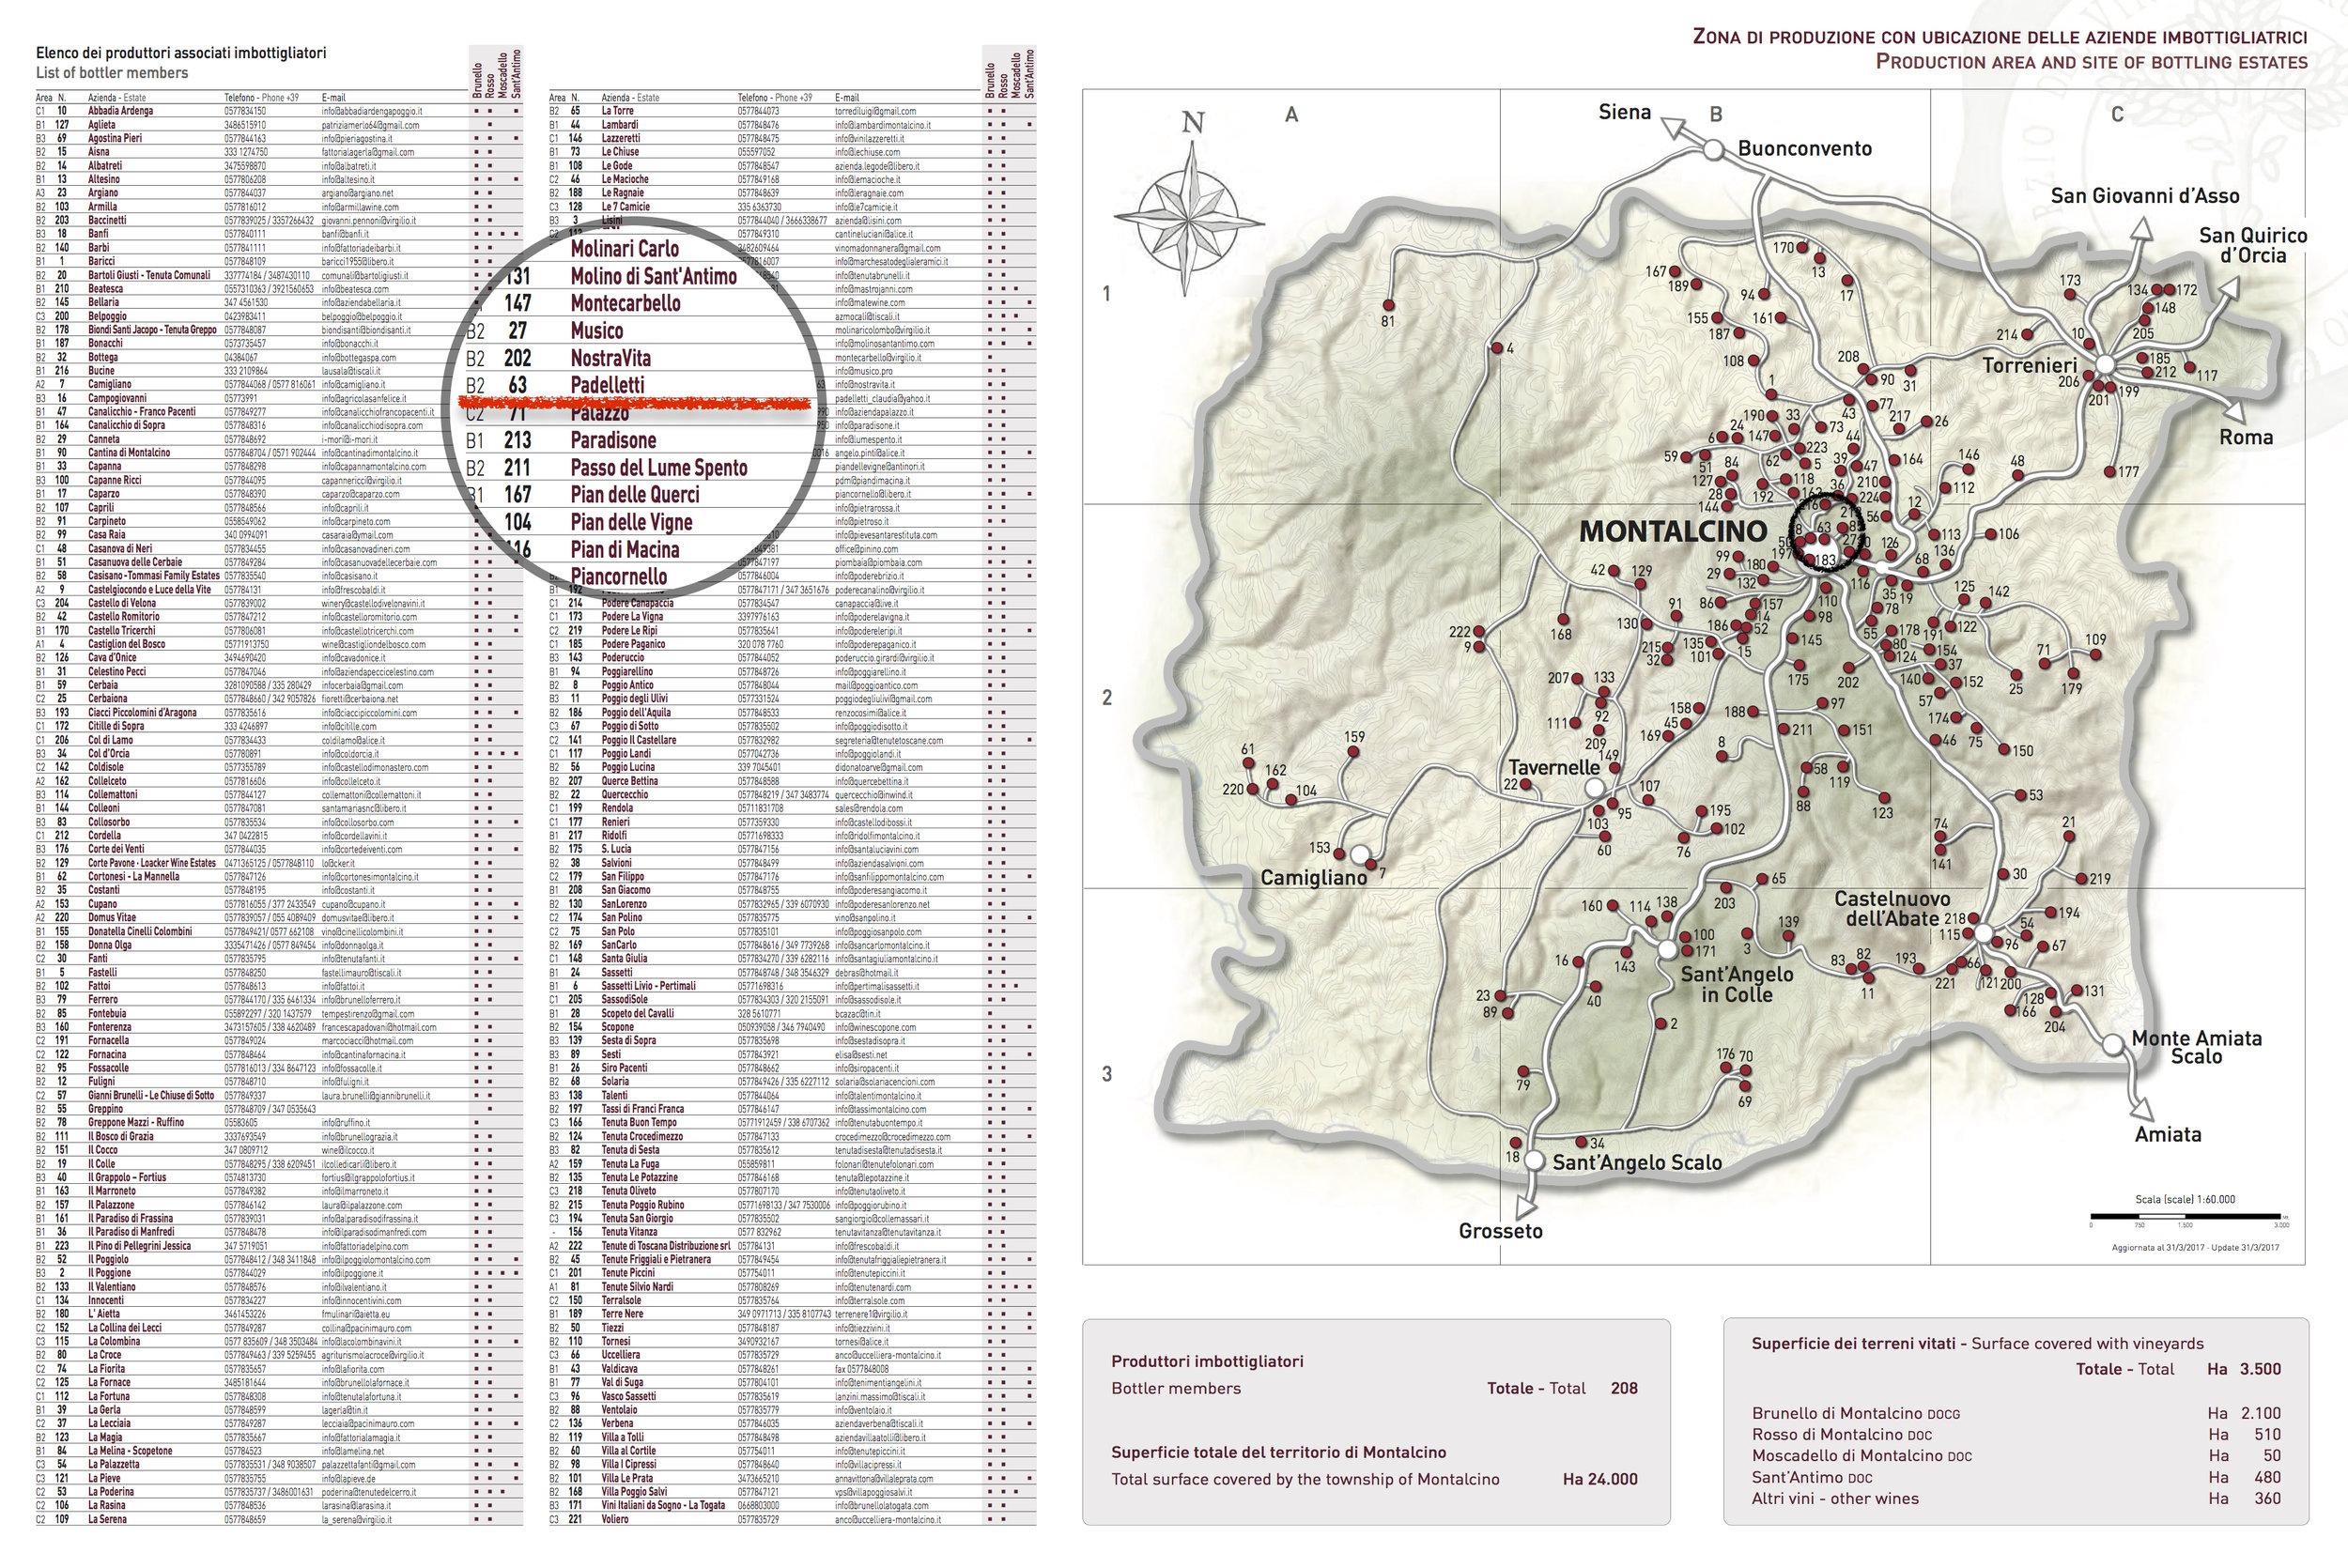 Producer Map of Montalcino 1 sheet.jpg